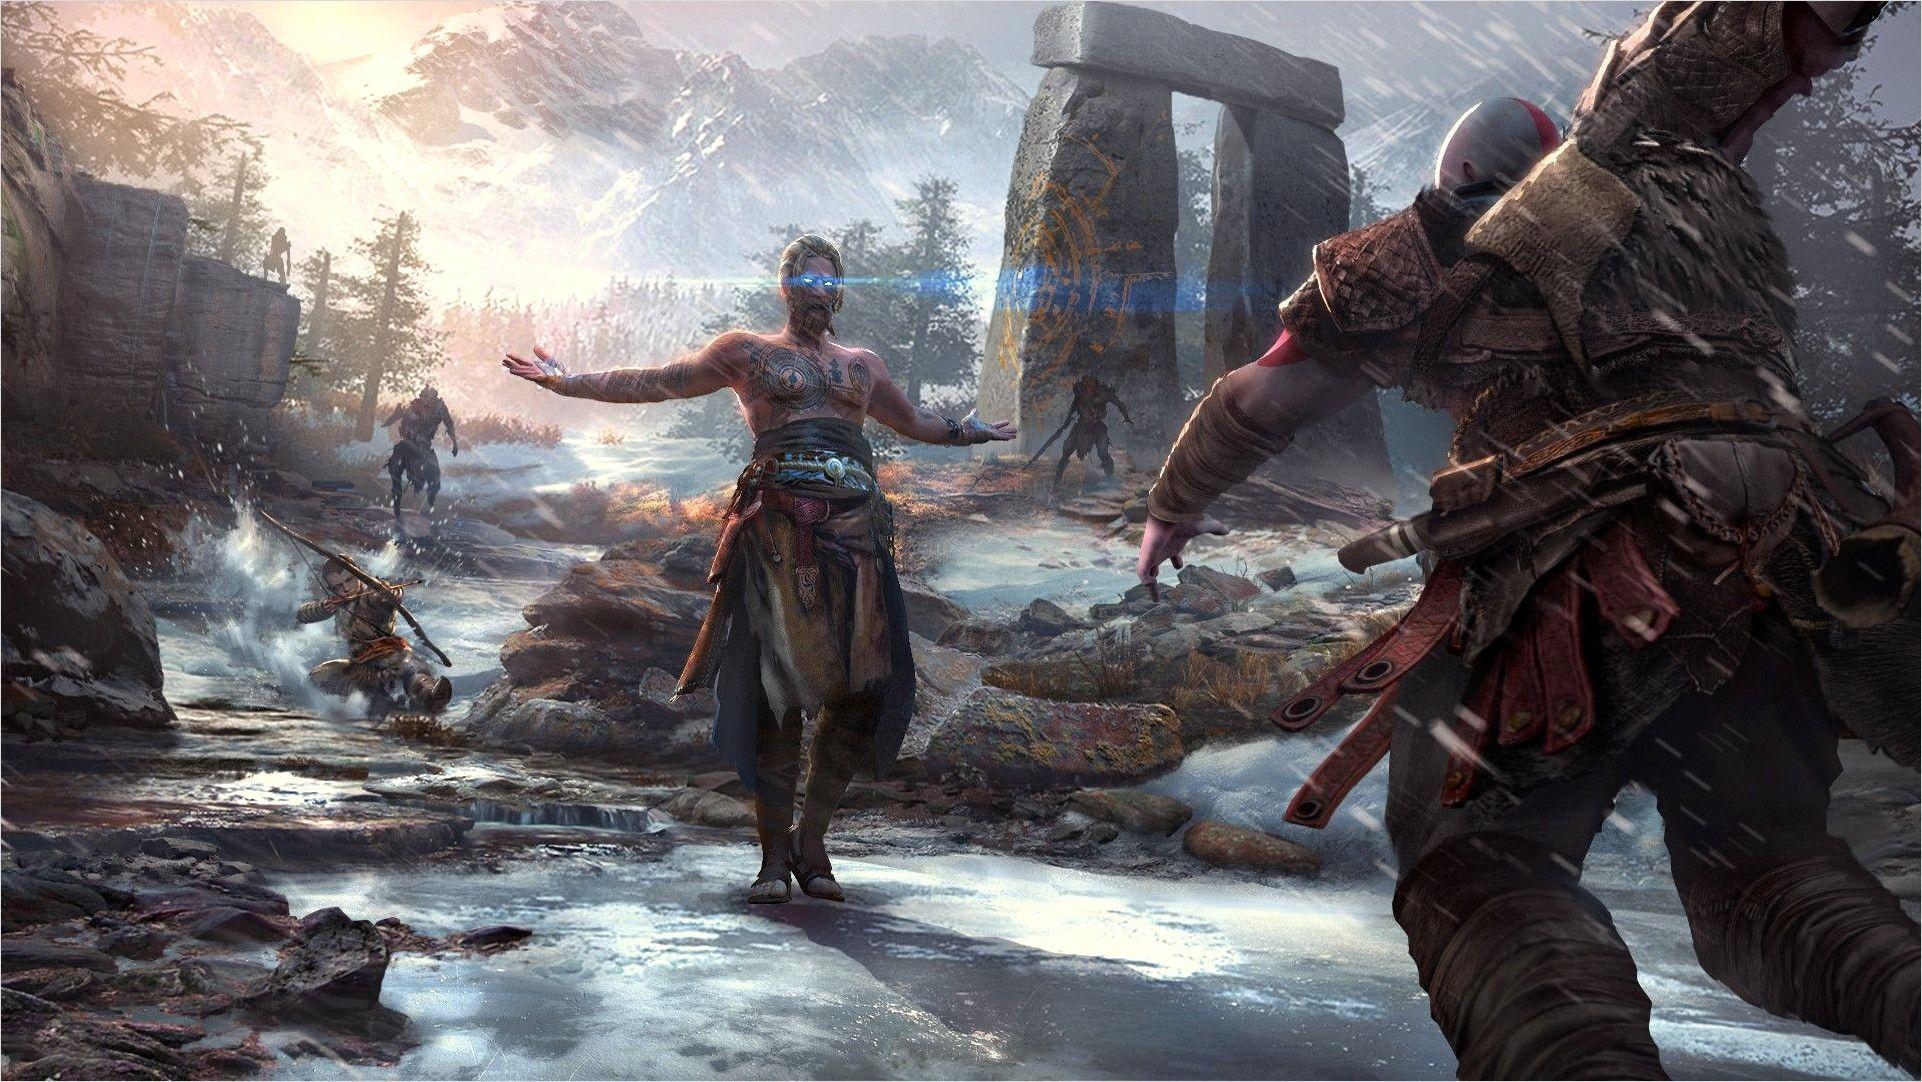 4k 1080p 1920 215 1080 God Of War Wallpaper In 2020 Kratos God Of War God Of War God Of War Series